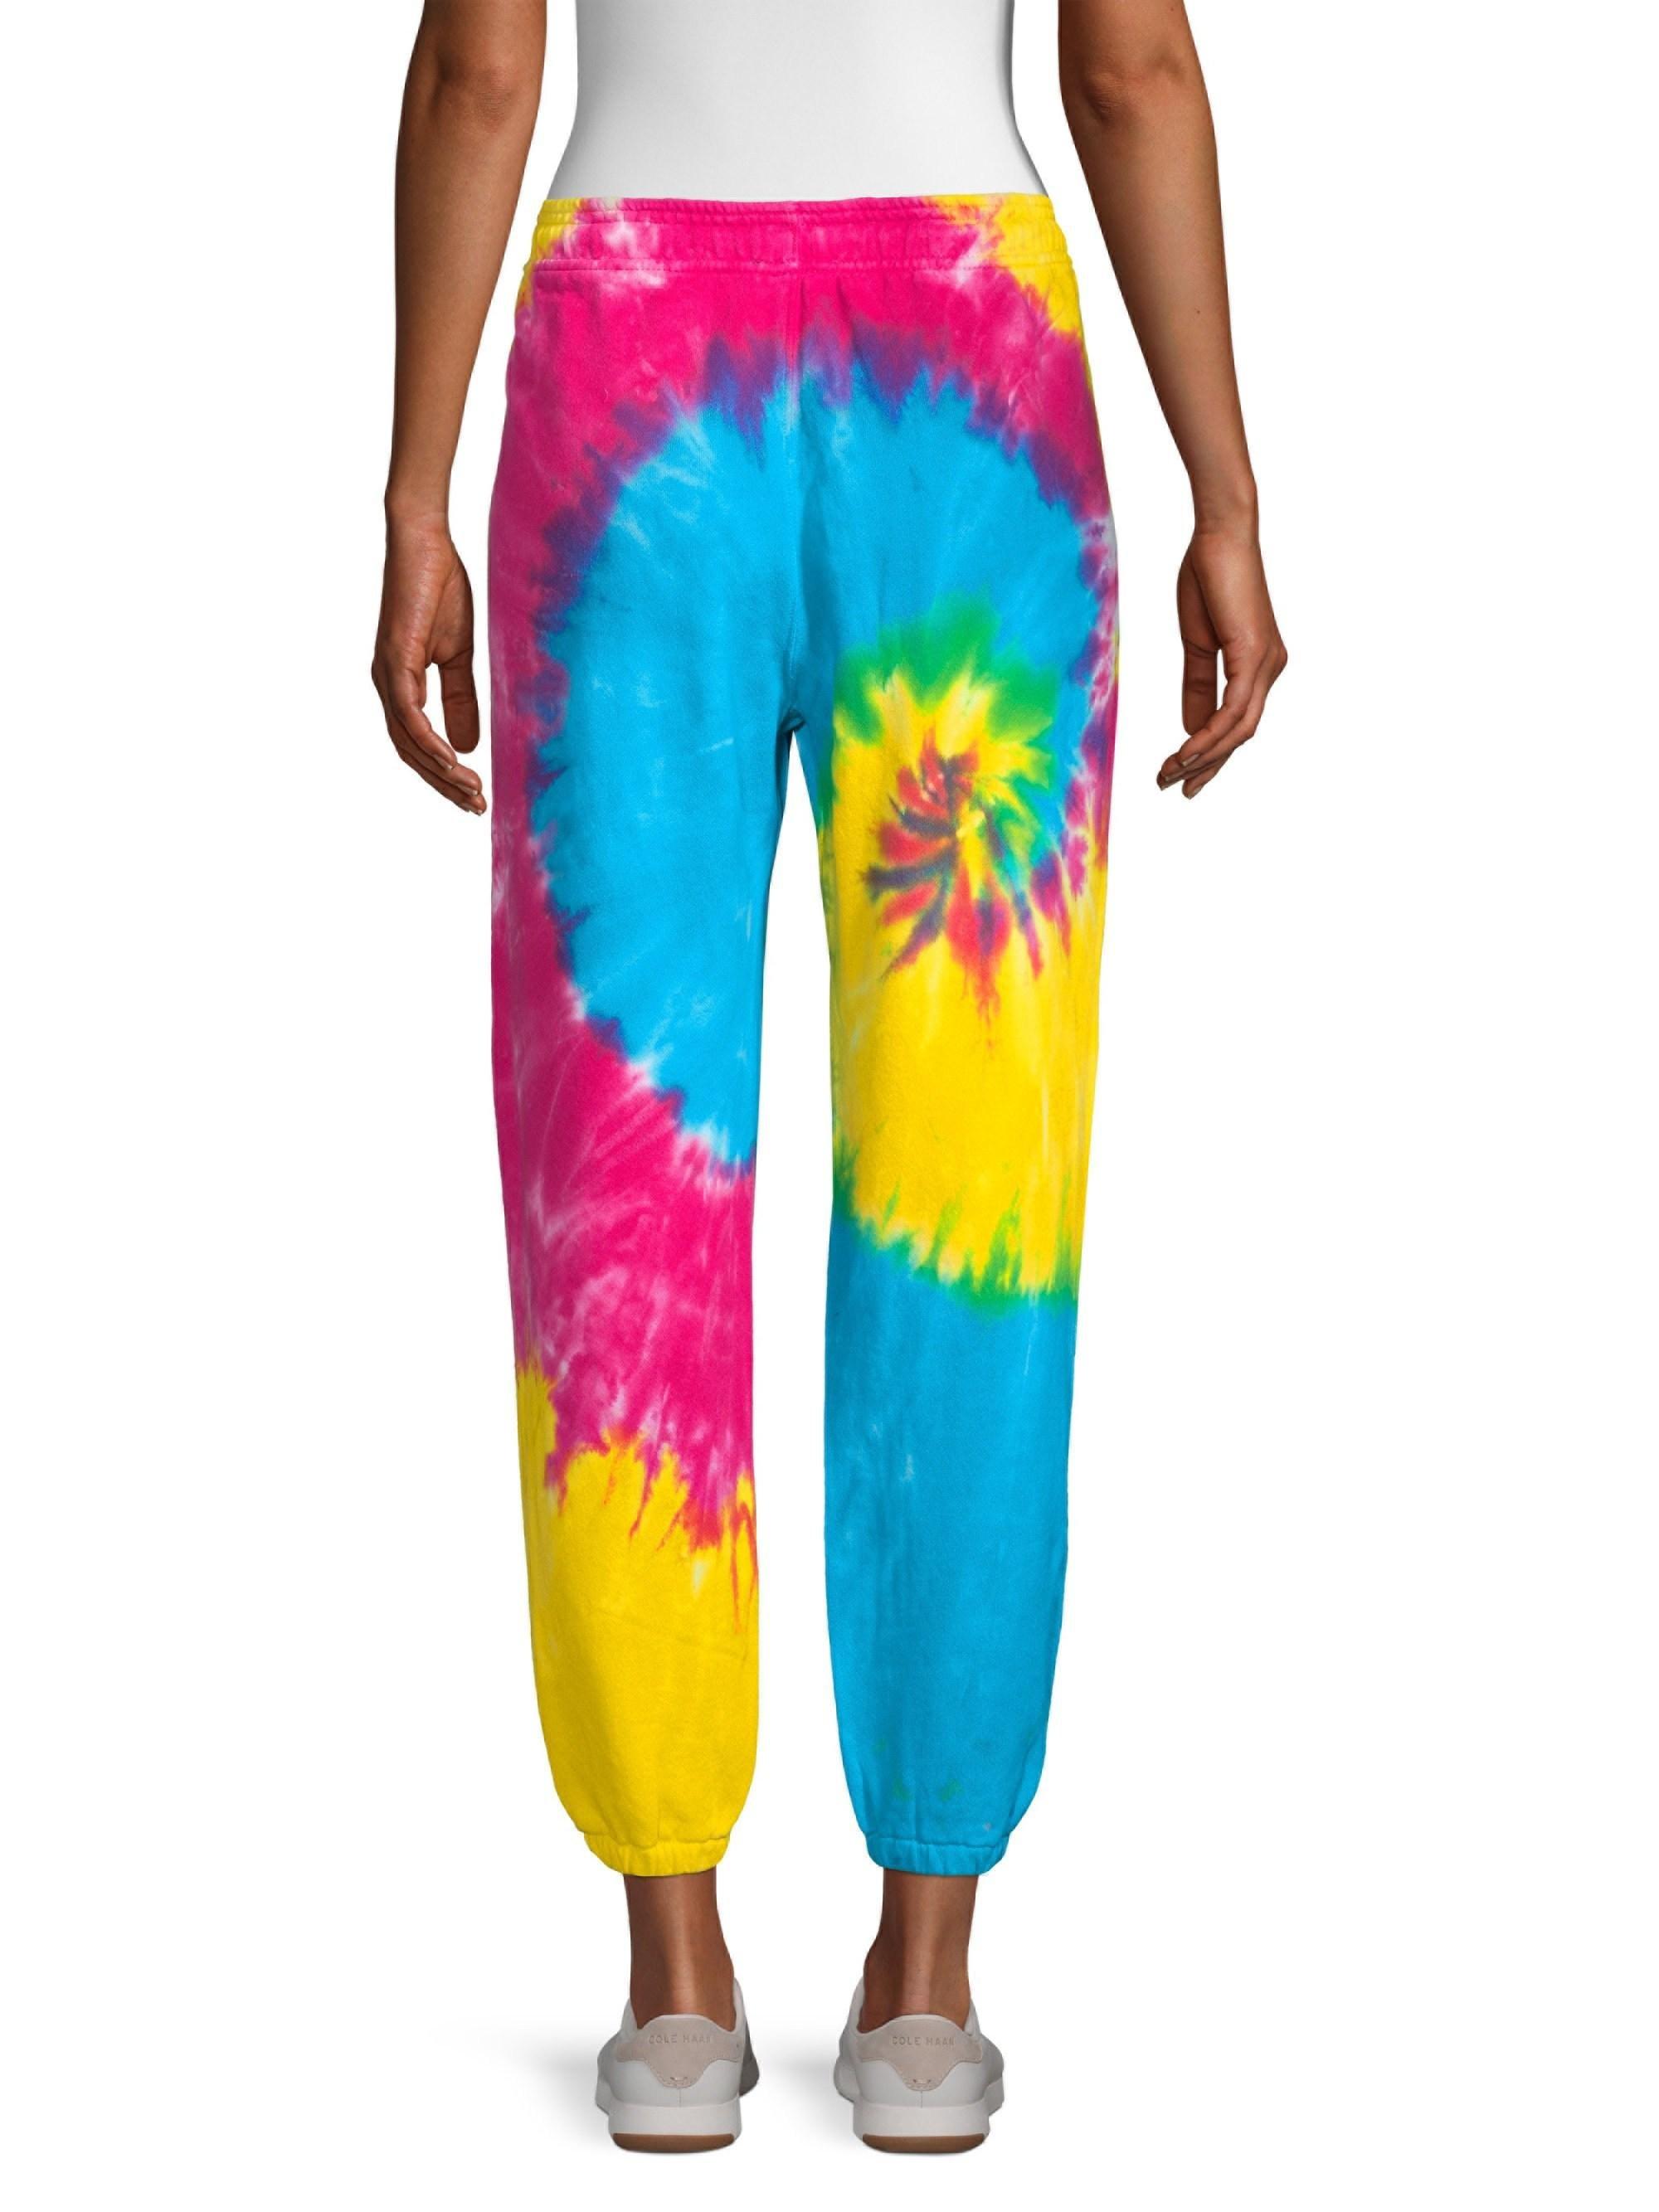 b427c203c834 Polo Ralph Lauren Women's Tie-dye Cotton Joggers - Pinwheel Tiedye ...